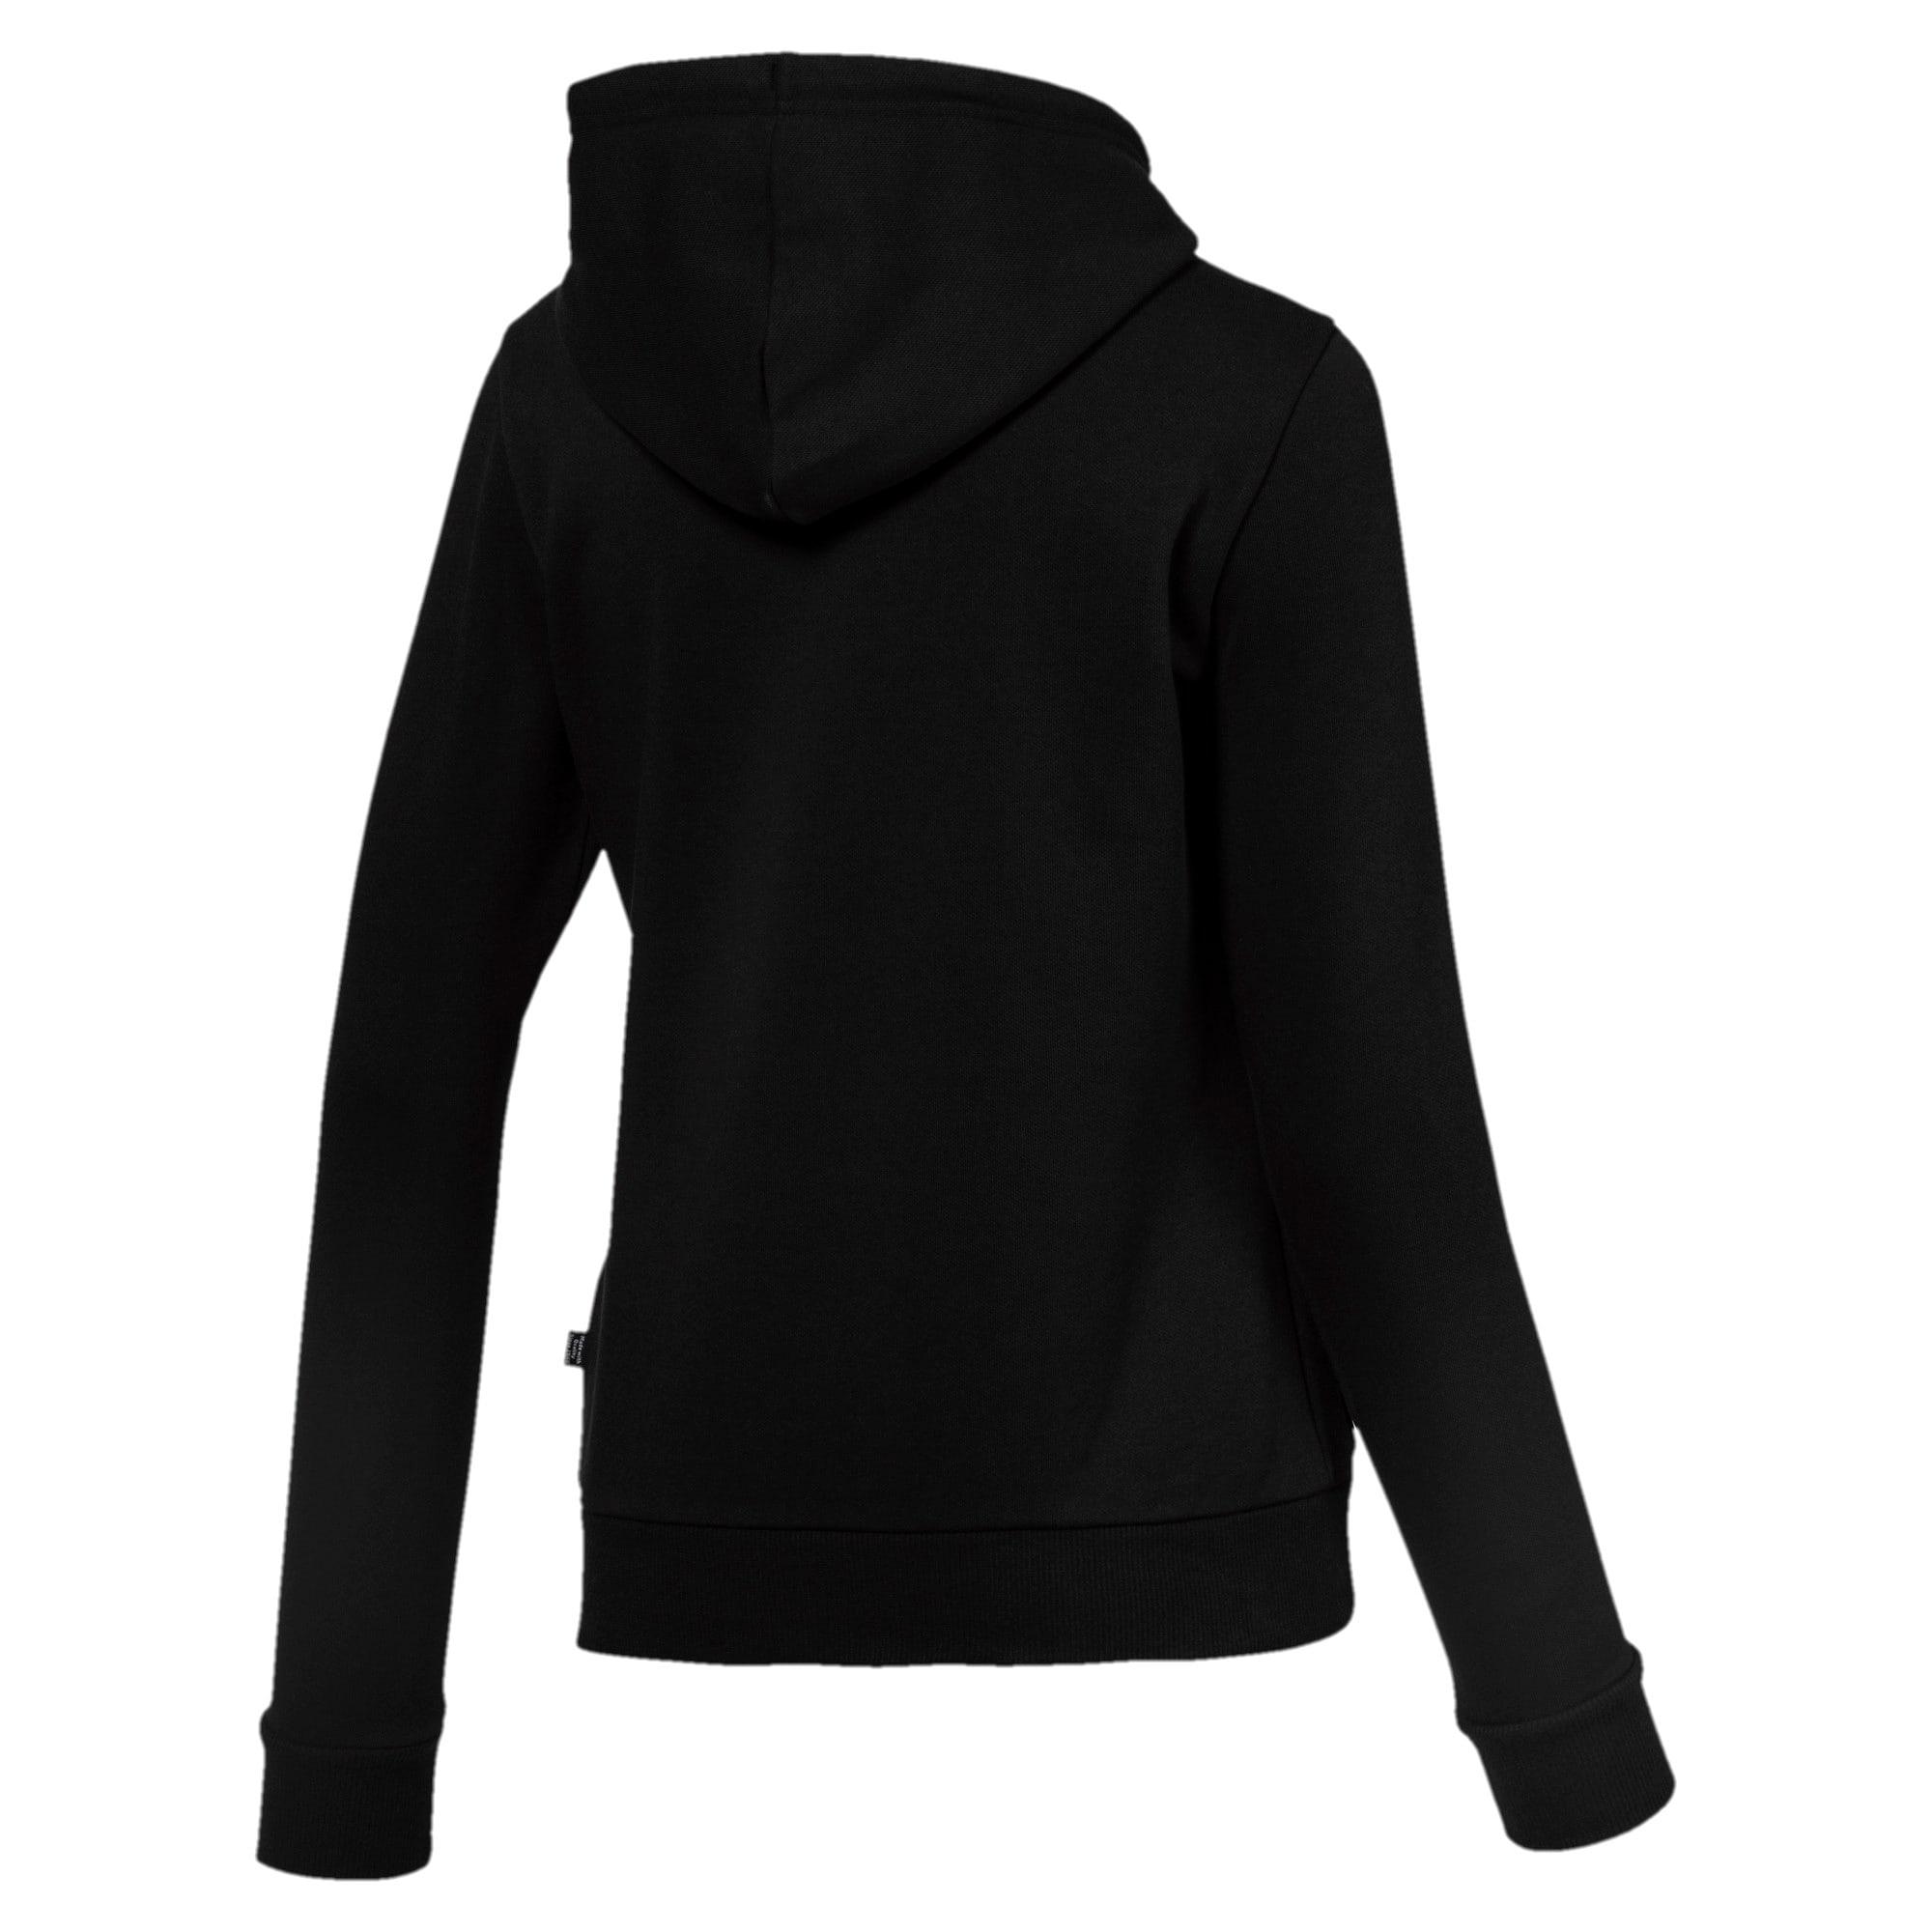 Thumbnail 5 of Essentials Fleece Women's Hoodie, Cotton Black, medium